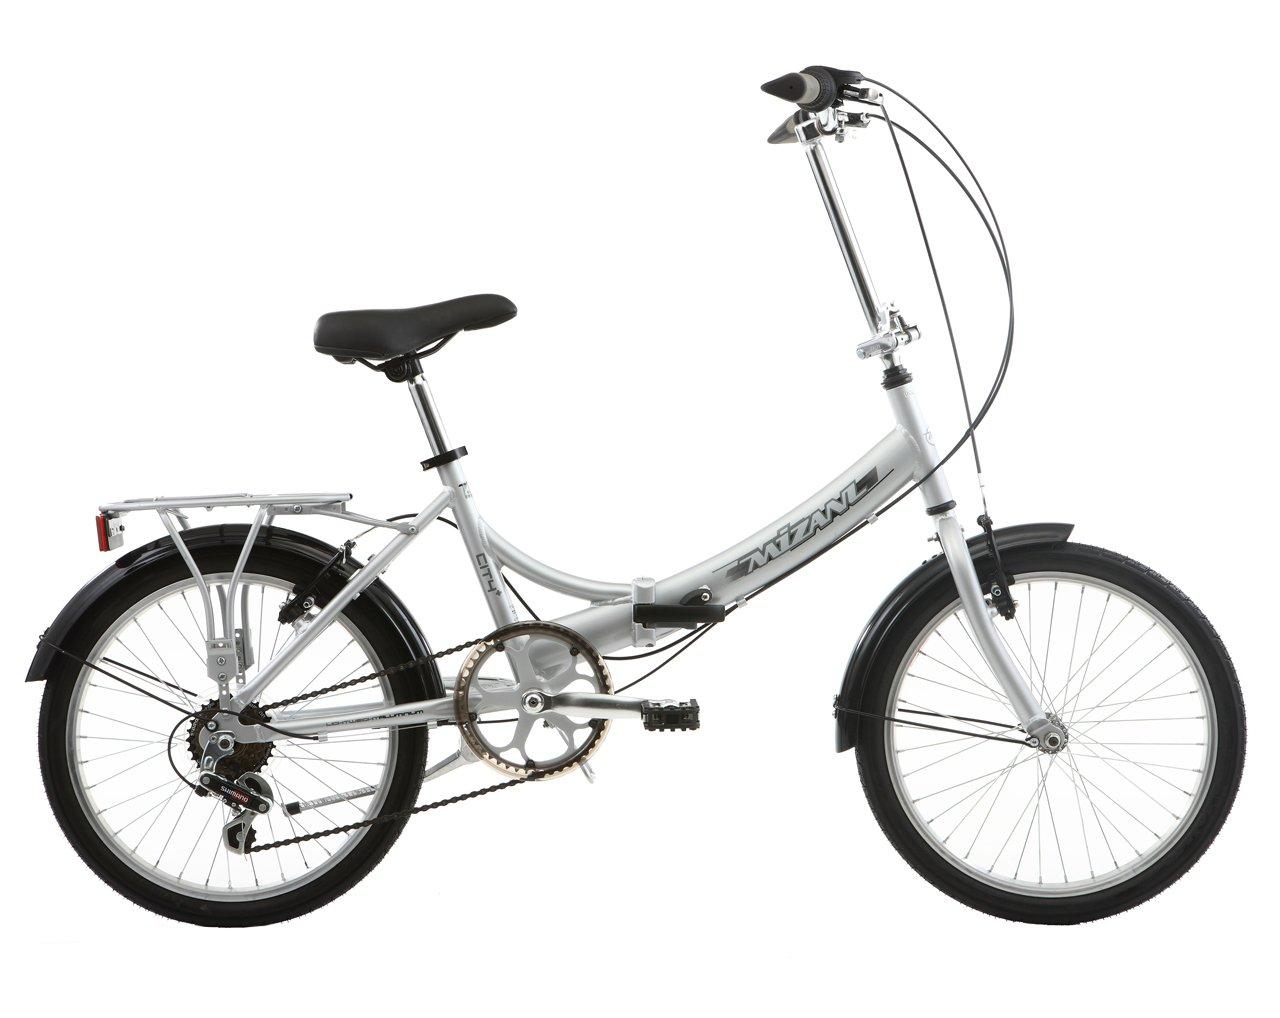 Bicicleta urbana plegable plata